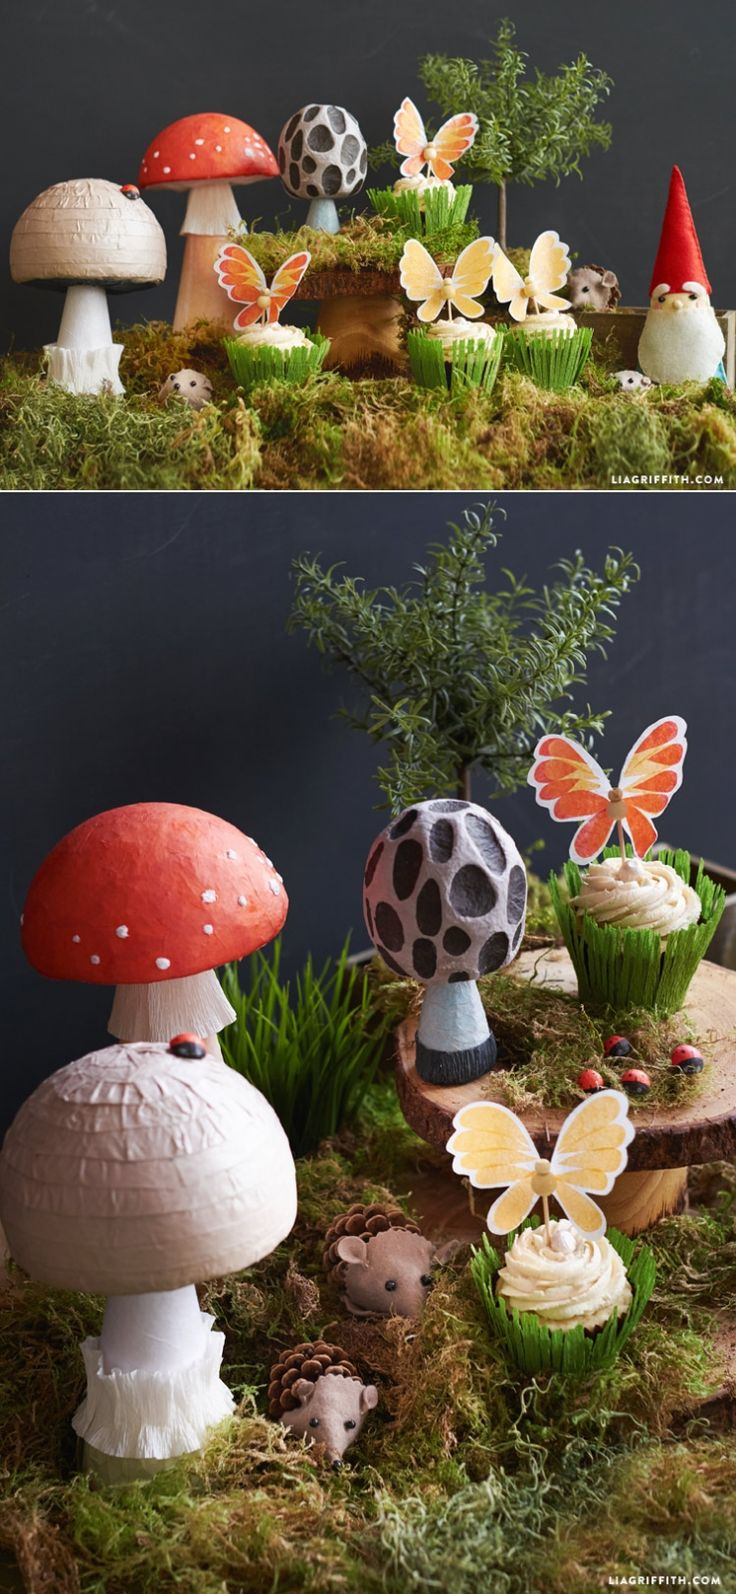 Fairy lawn ornaments - Diy Fairy Tale Mushrooms